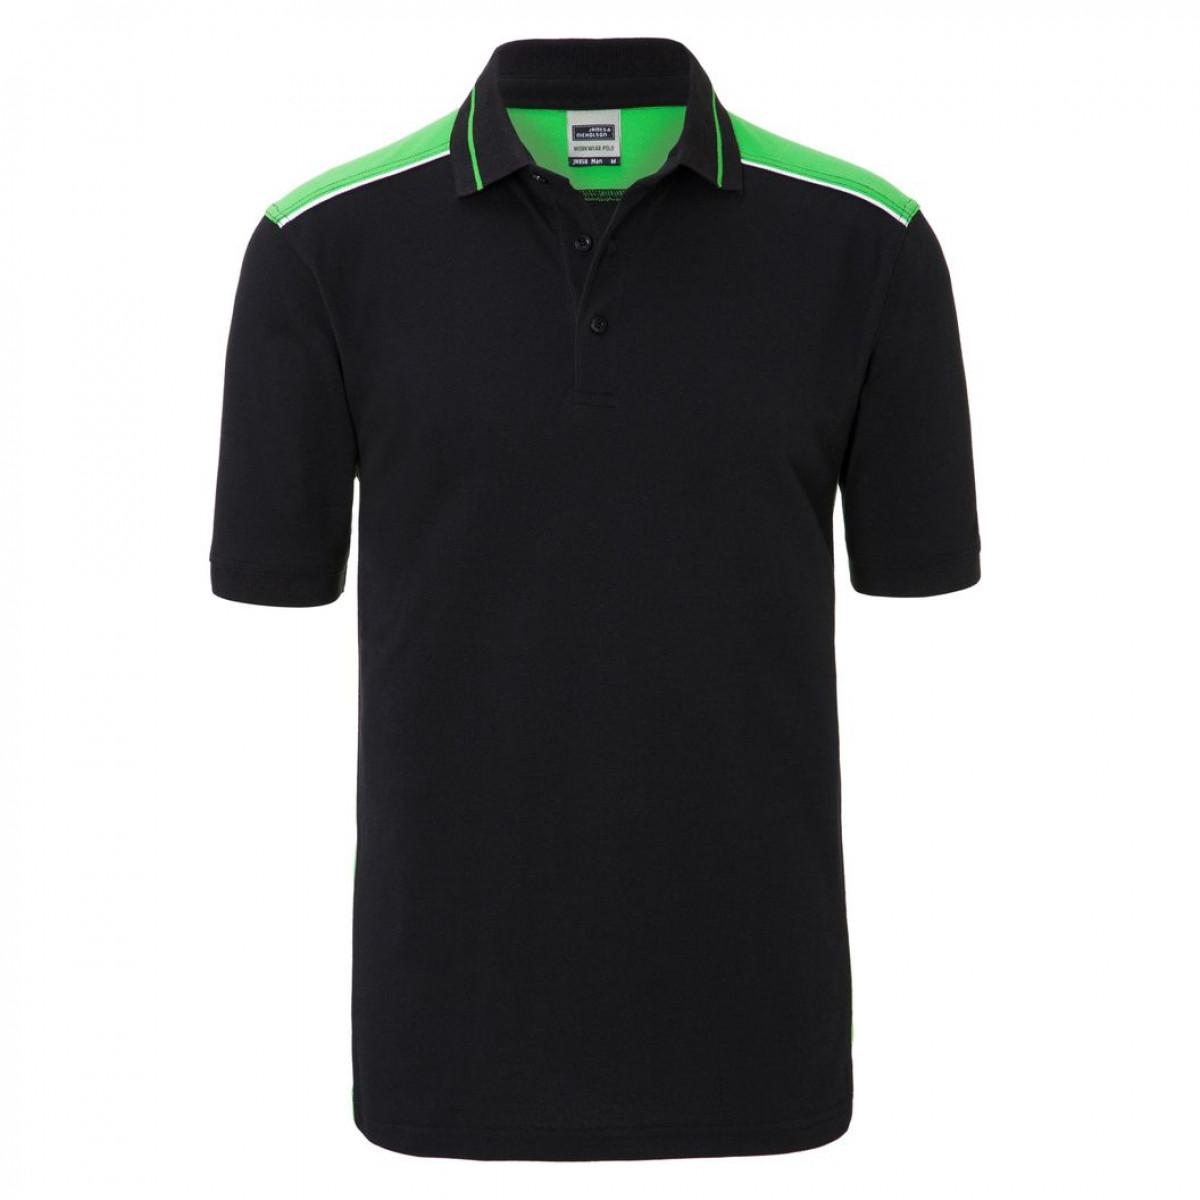 Рубашка поло мужская JN858 Mens Workwear Polo-Level 2 - Черный/Лайм